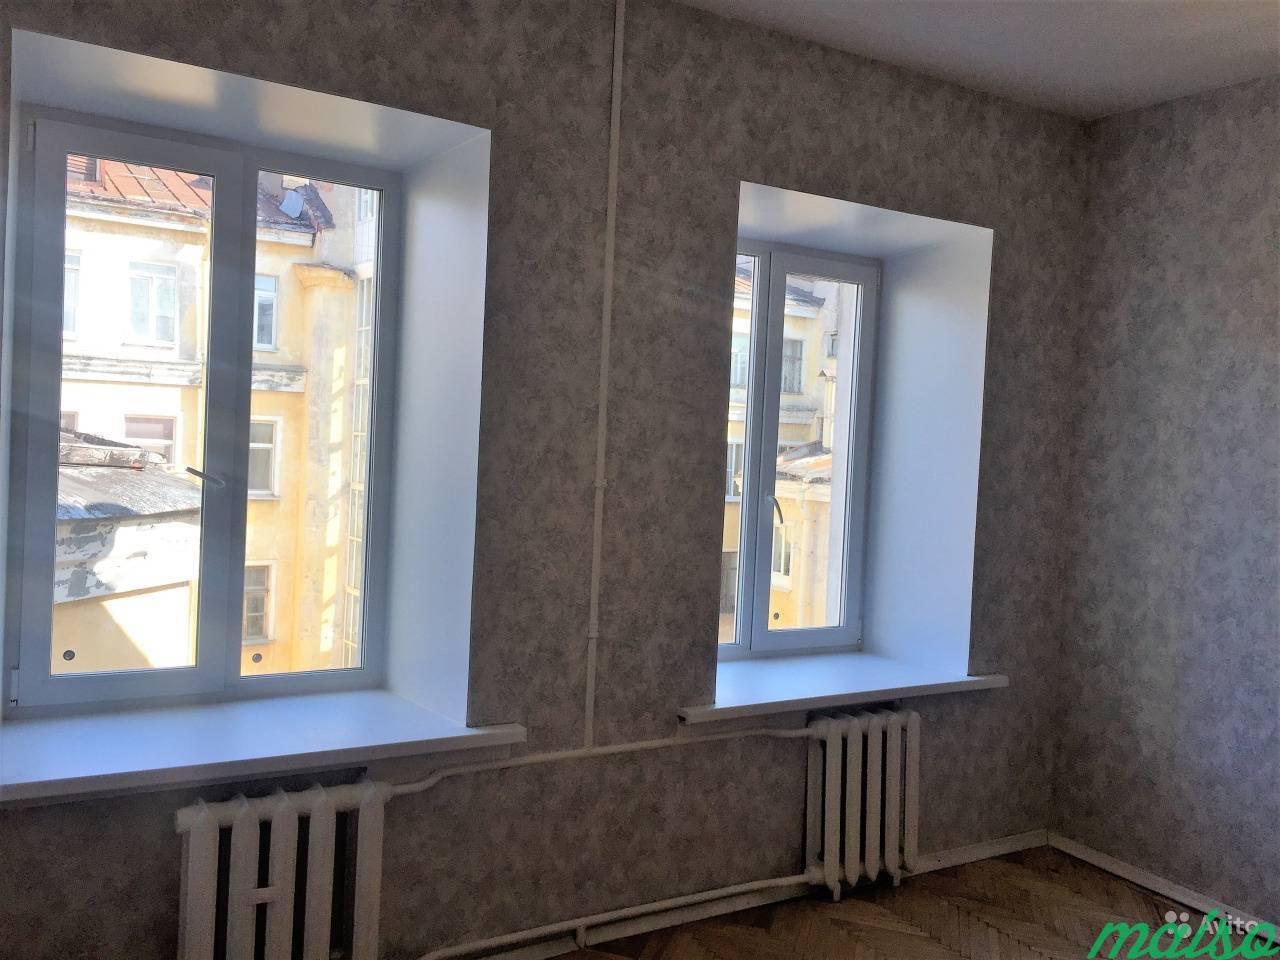 Комната 18.5 м² в 4-к, 5/6 эт. в Санкт-Петербурге. Фото 2